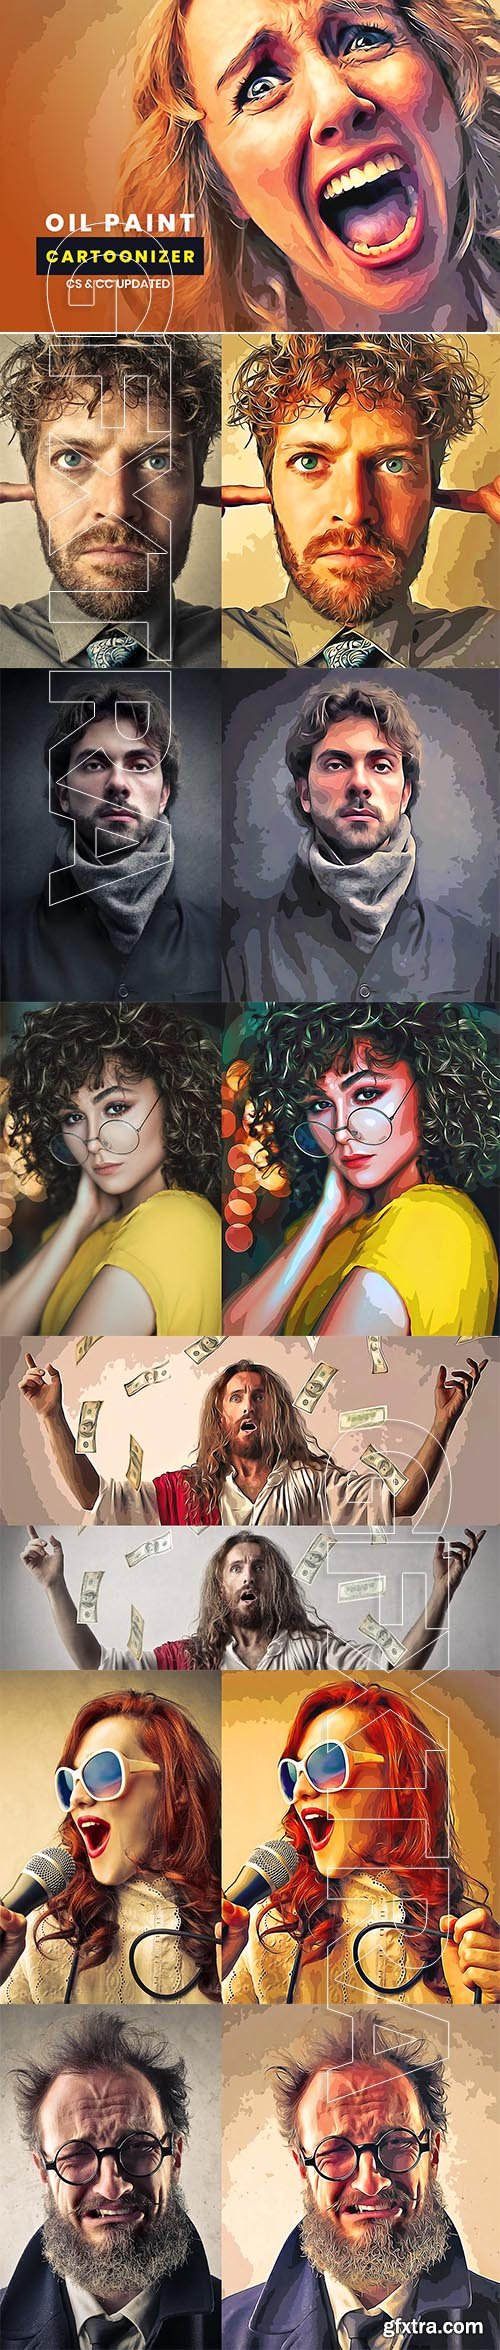 CreativeMarket - Oil Paint Cartoonizer 5507645